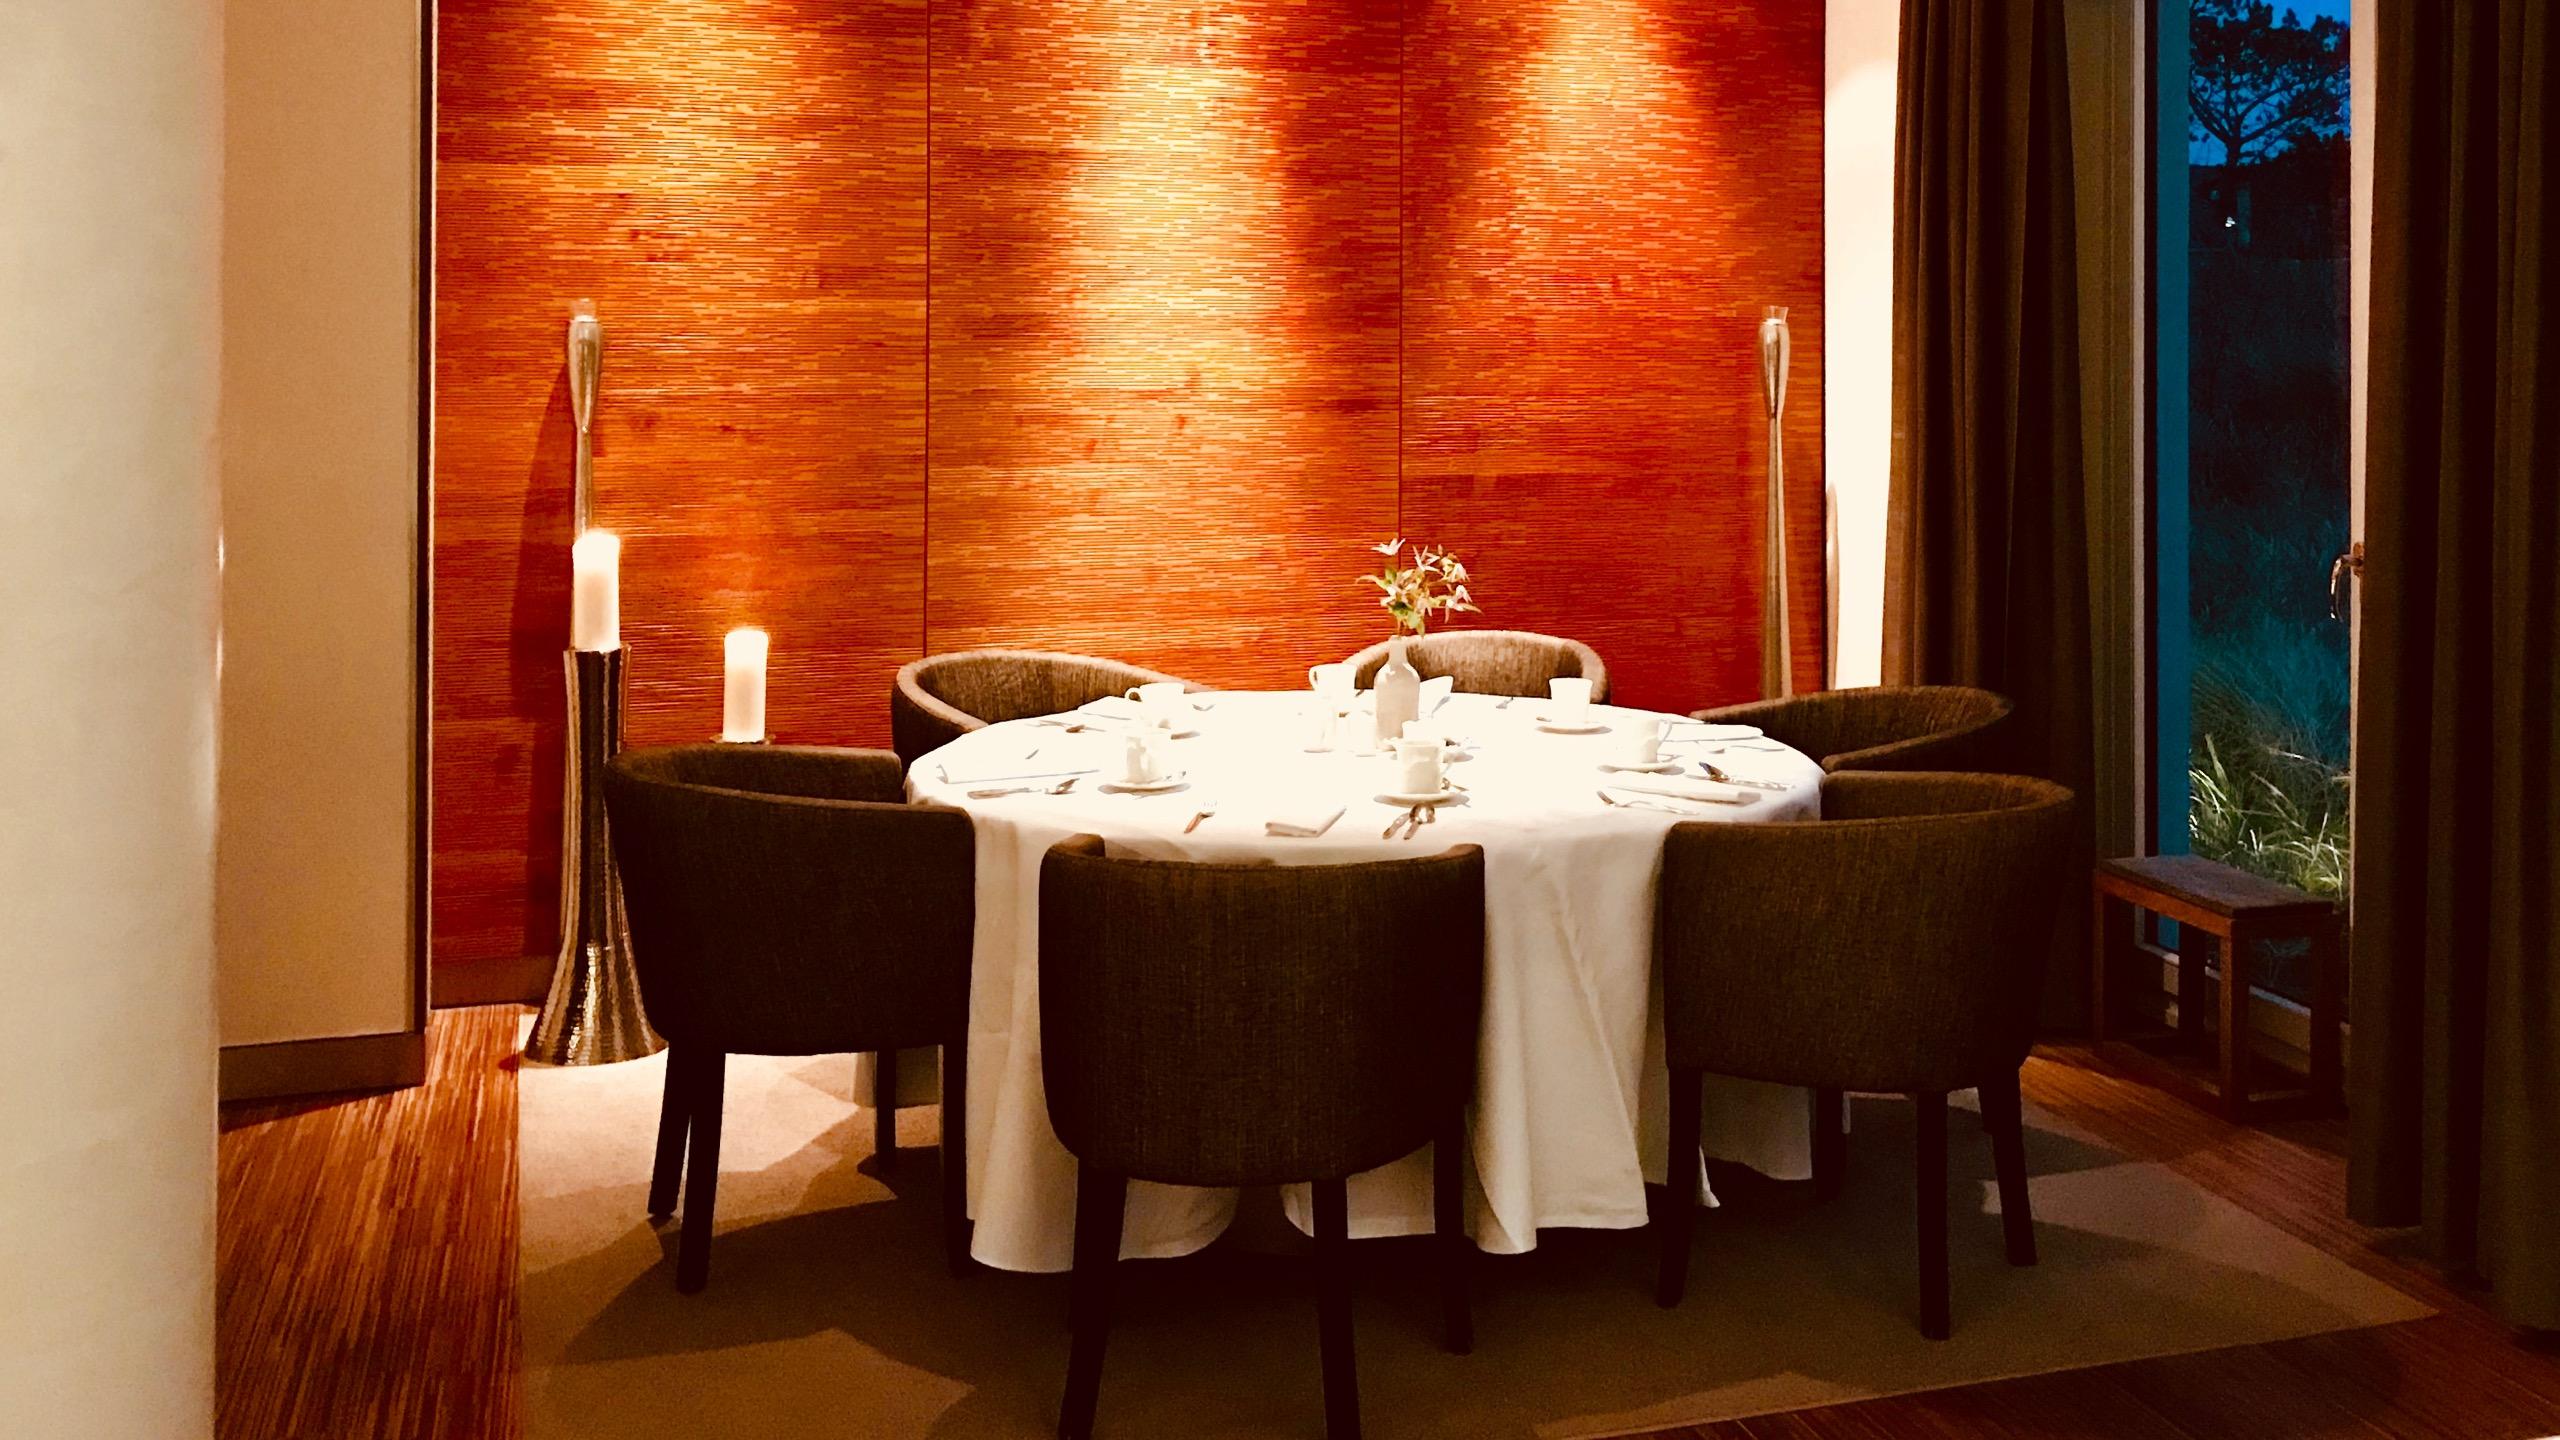 Sylt List A-ROSA Hotel Restaurant Dünenrestaurant 1